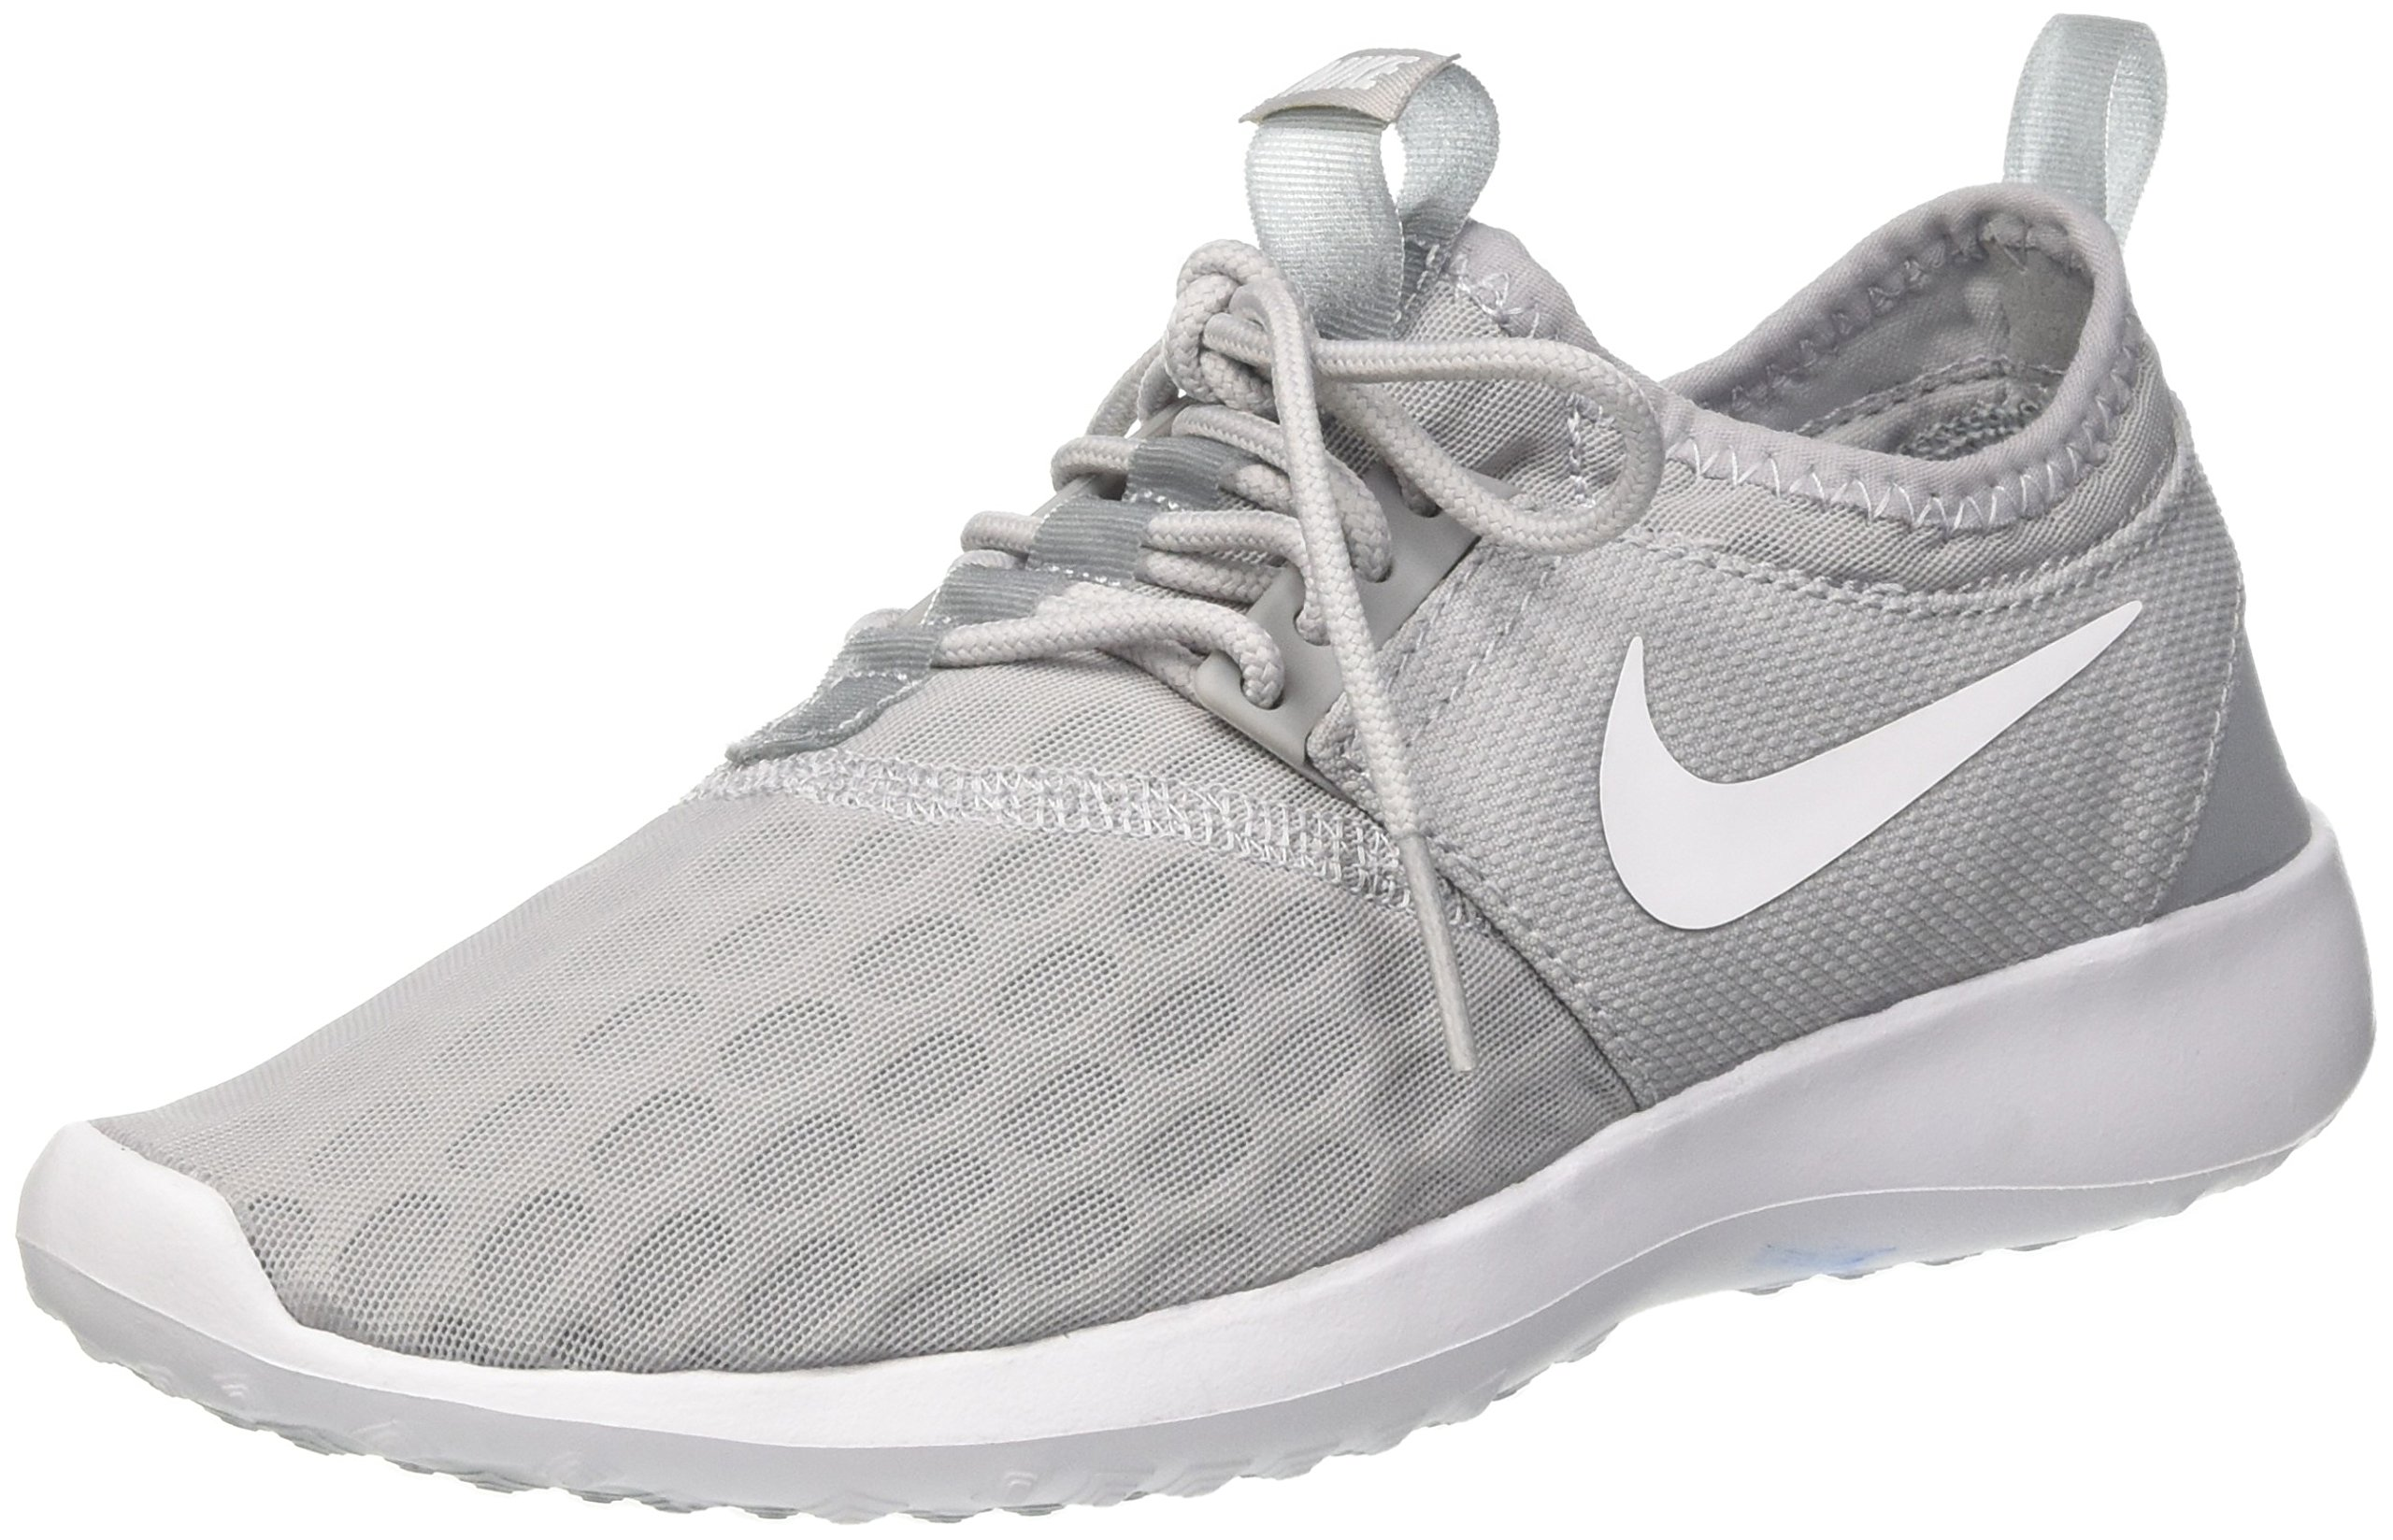 the latest 89230 6ea33 Galleon - Nike Women s Juvenate Sneaker Wolf Grey White 8.5 B US